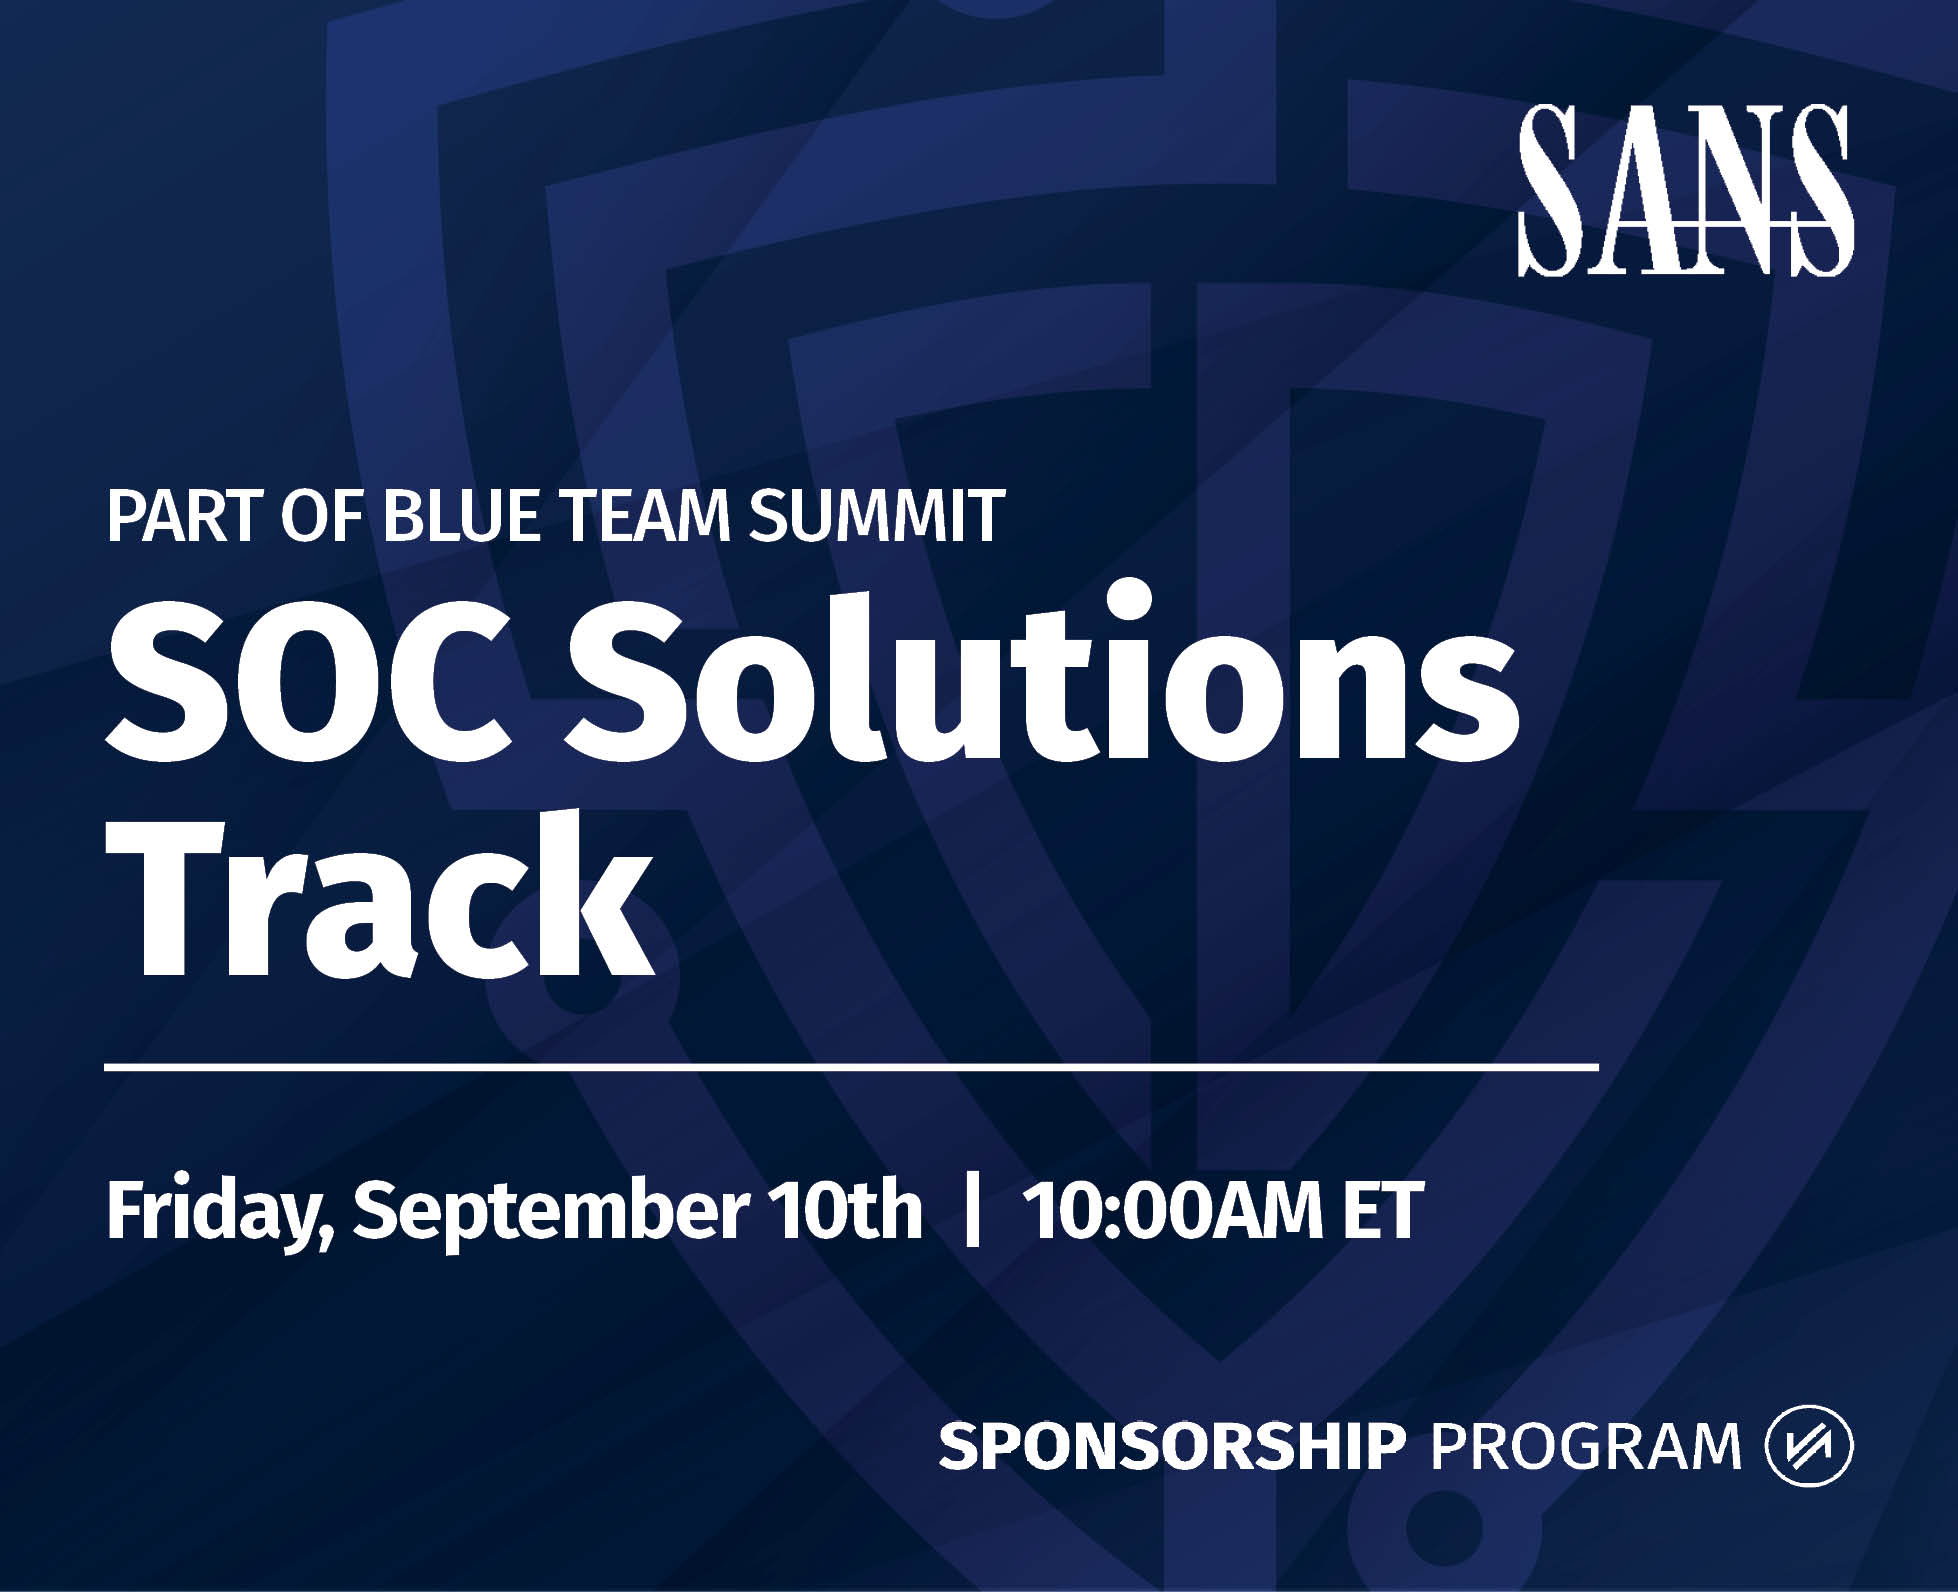 SOC_Solutions_Track_-_Webcast_Reg_Page.jpg